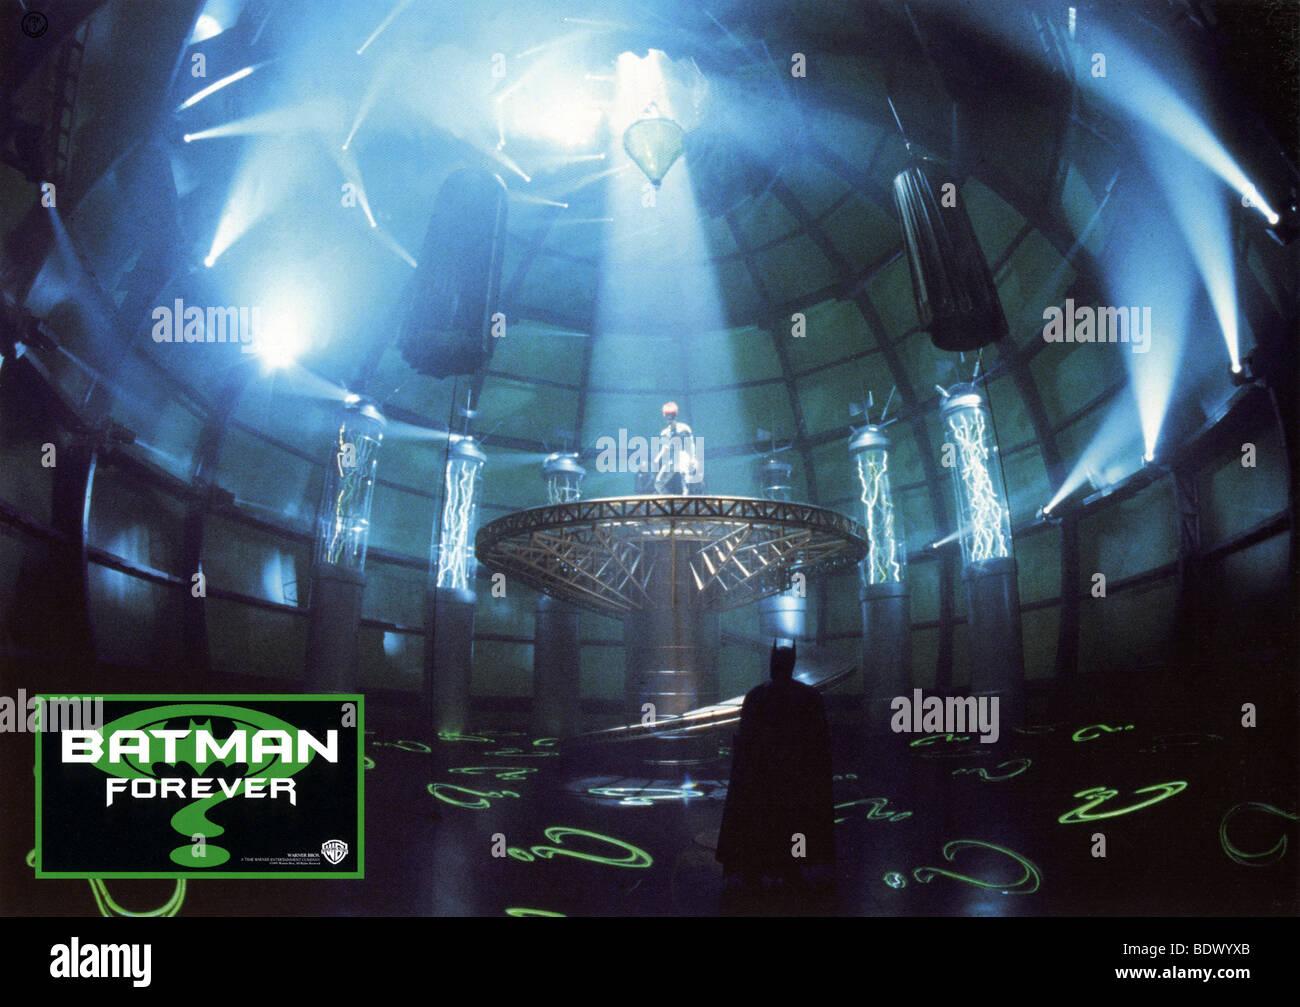 BATMAN FOREVER  - 1995 Warner film - Stock Image